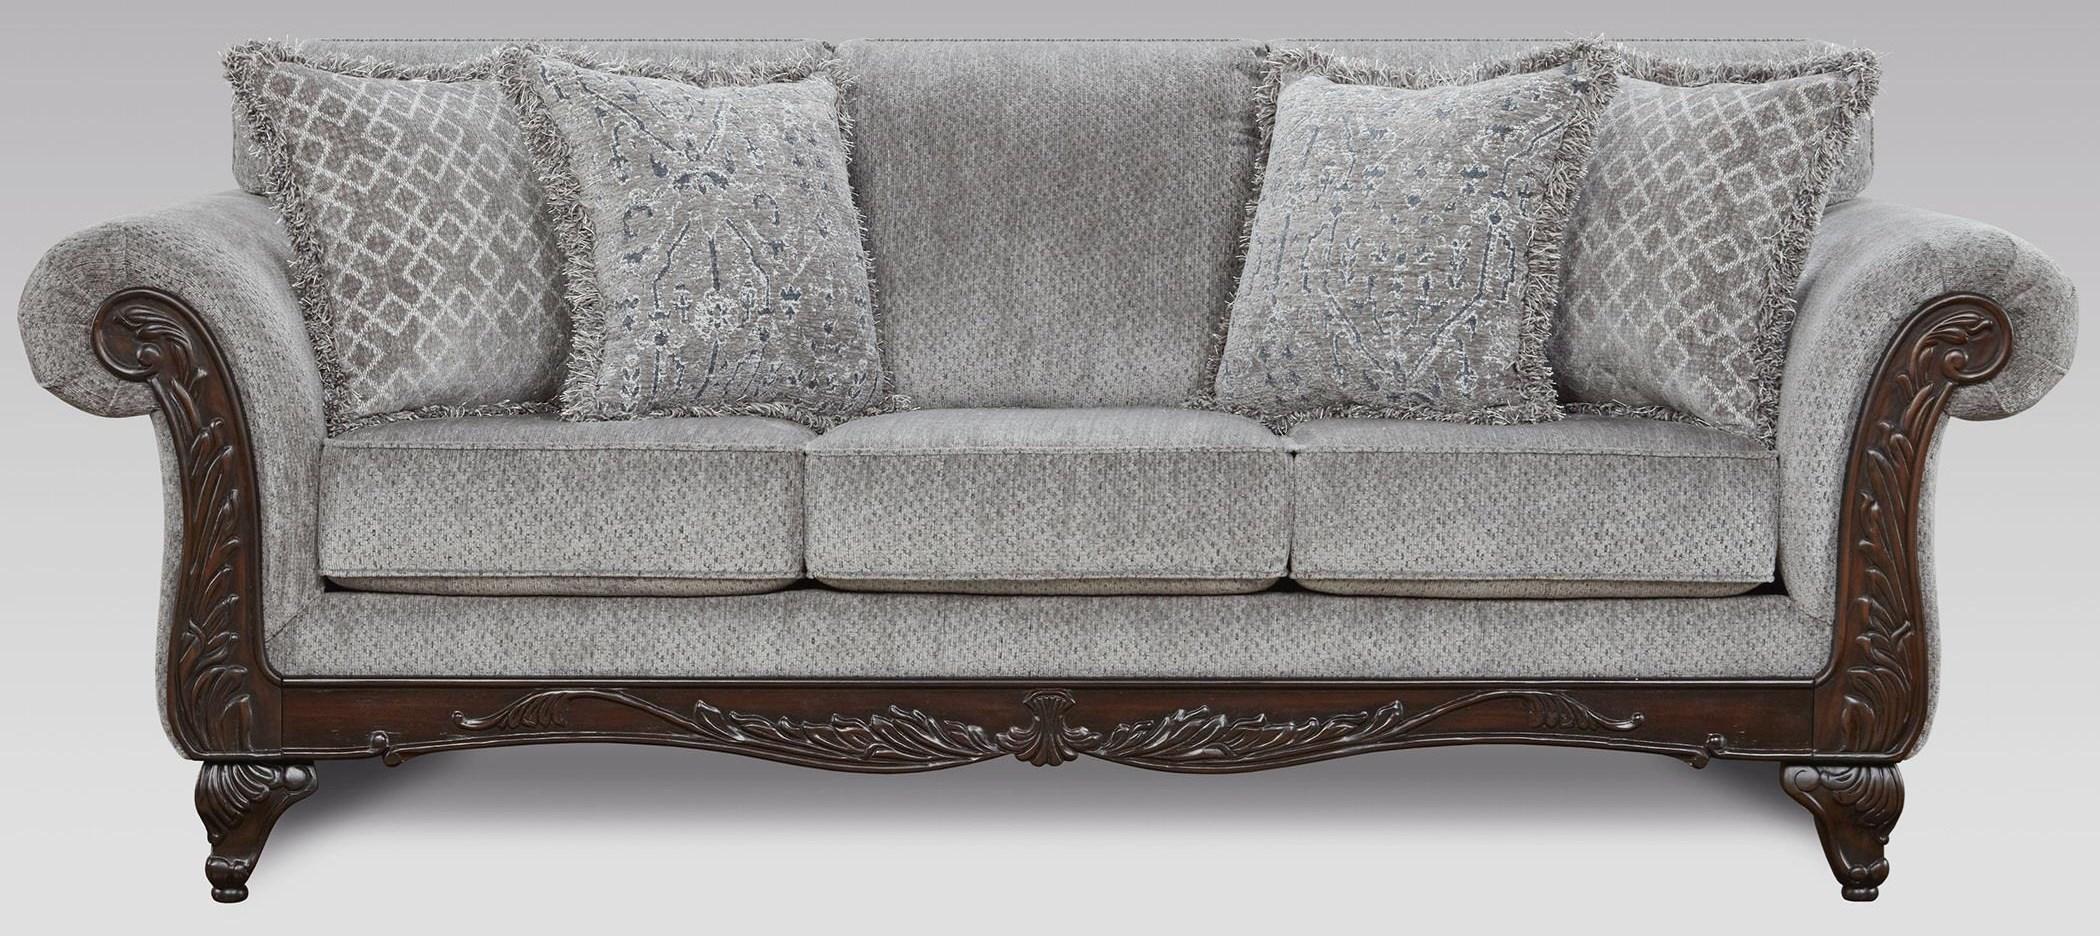 8550 Emma Upholstered Sofa by Affordable Furniture at Furniture Fair - North Carolina